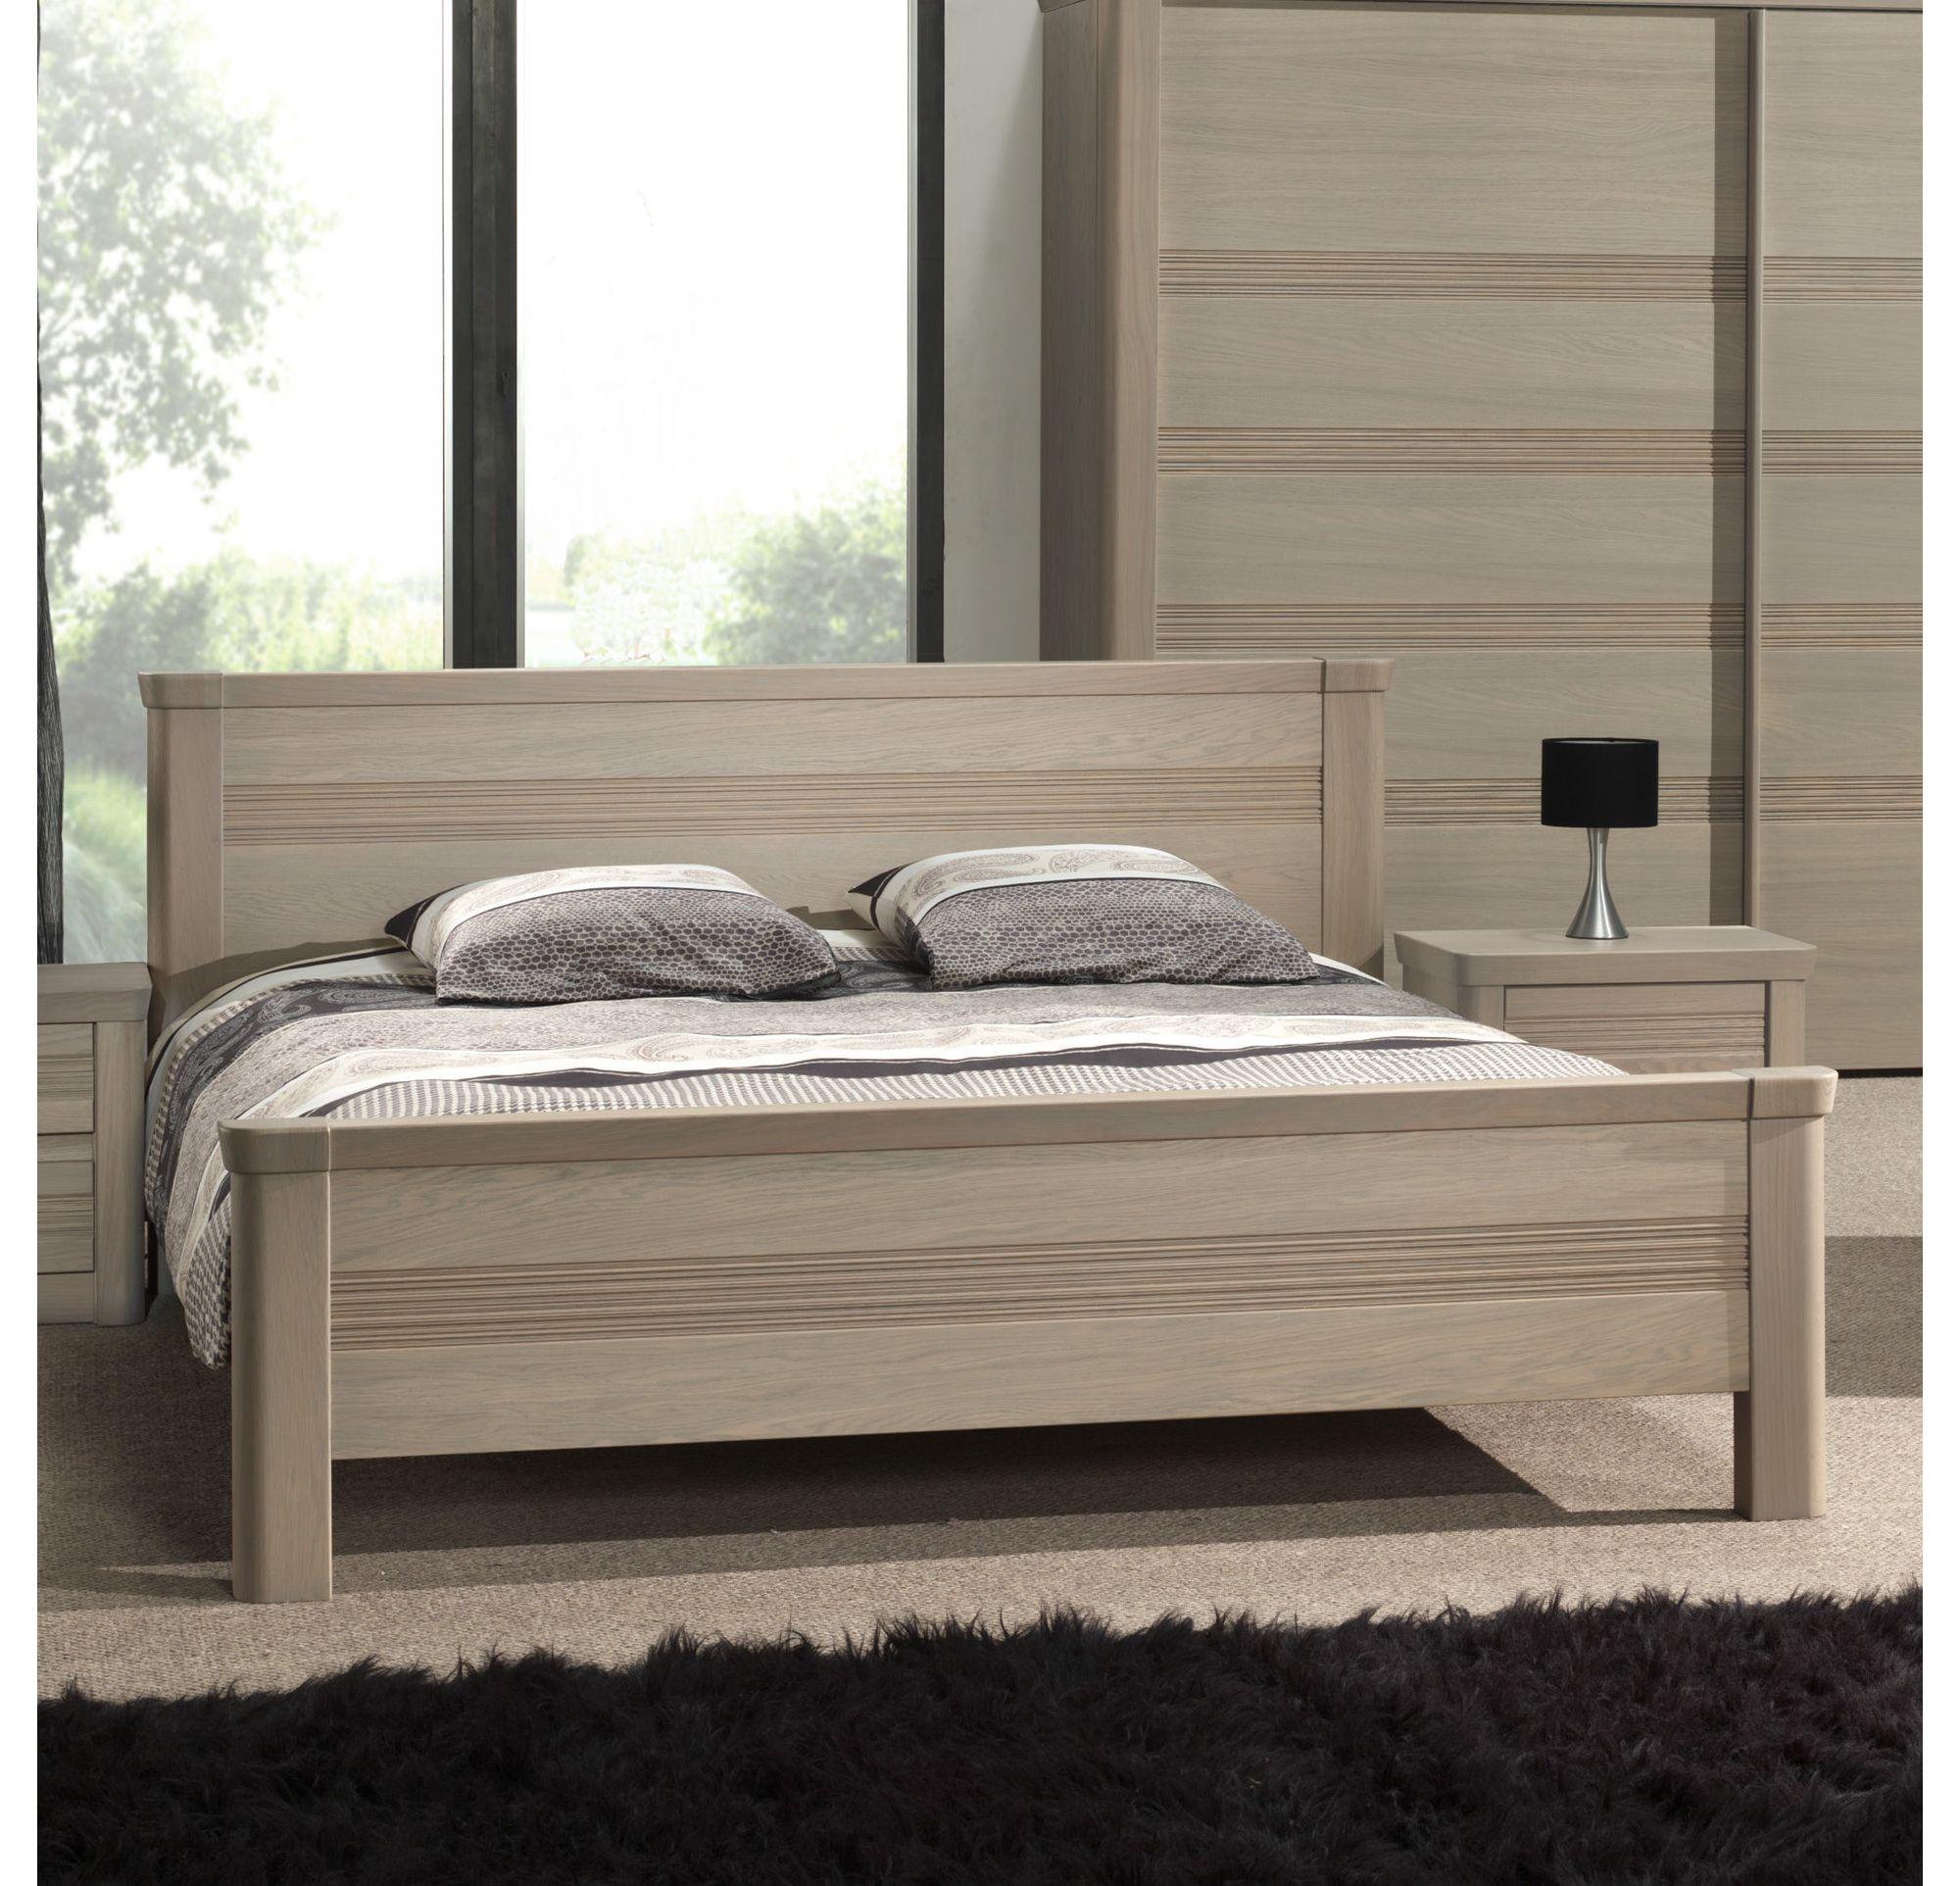 Tesco Sophia Bedroom Furniture